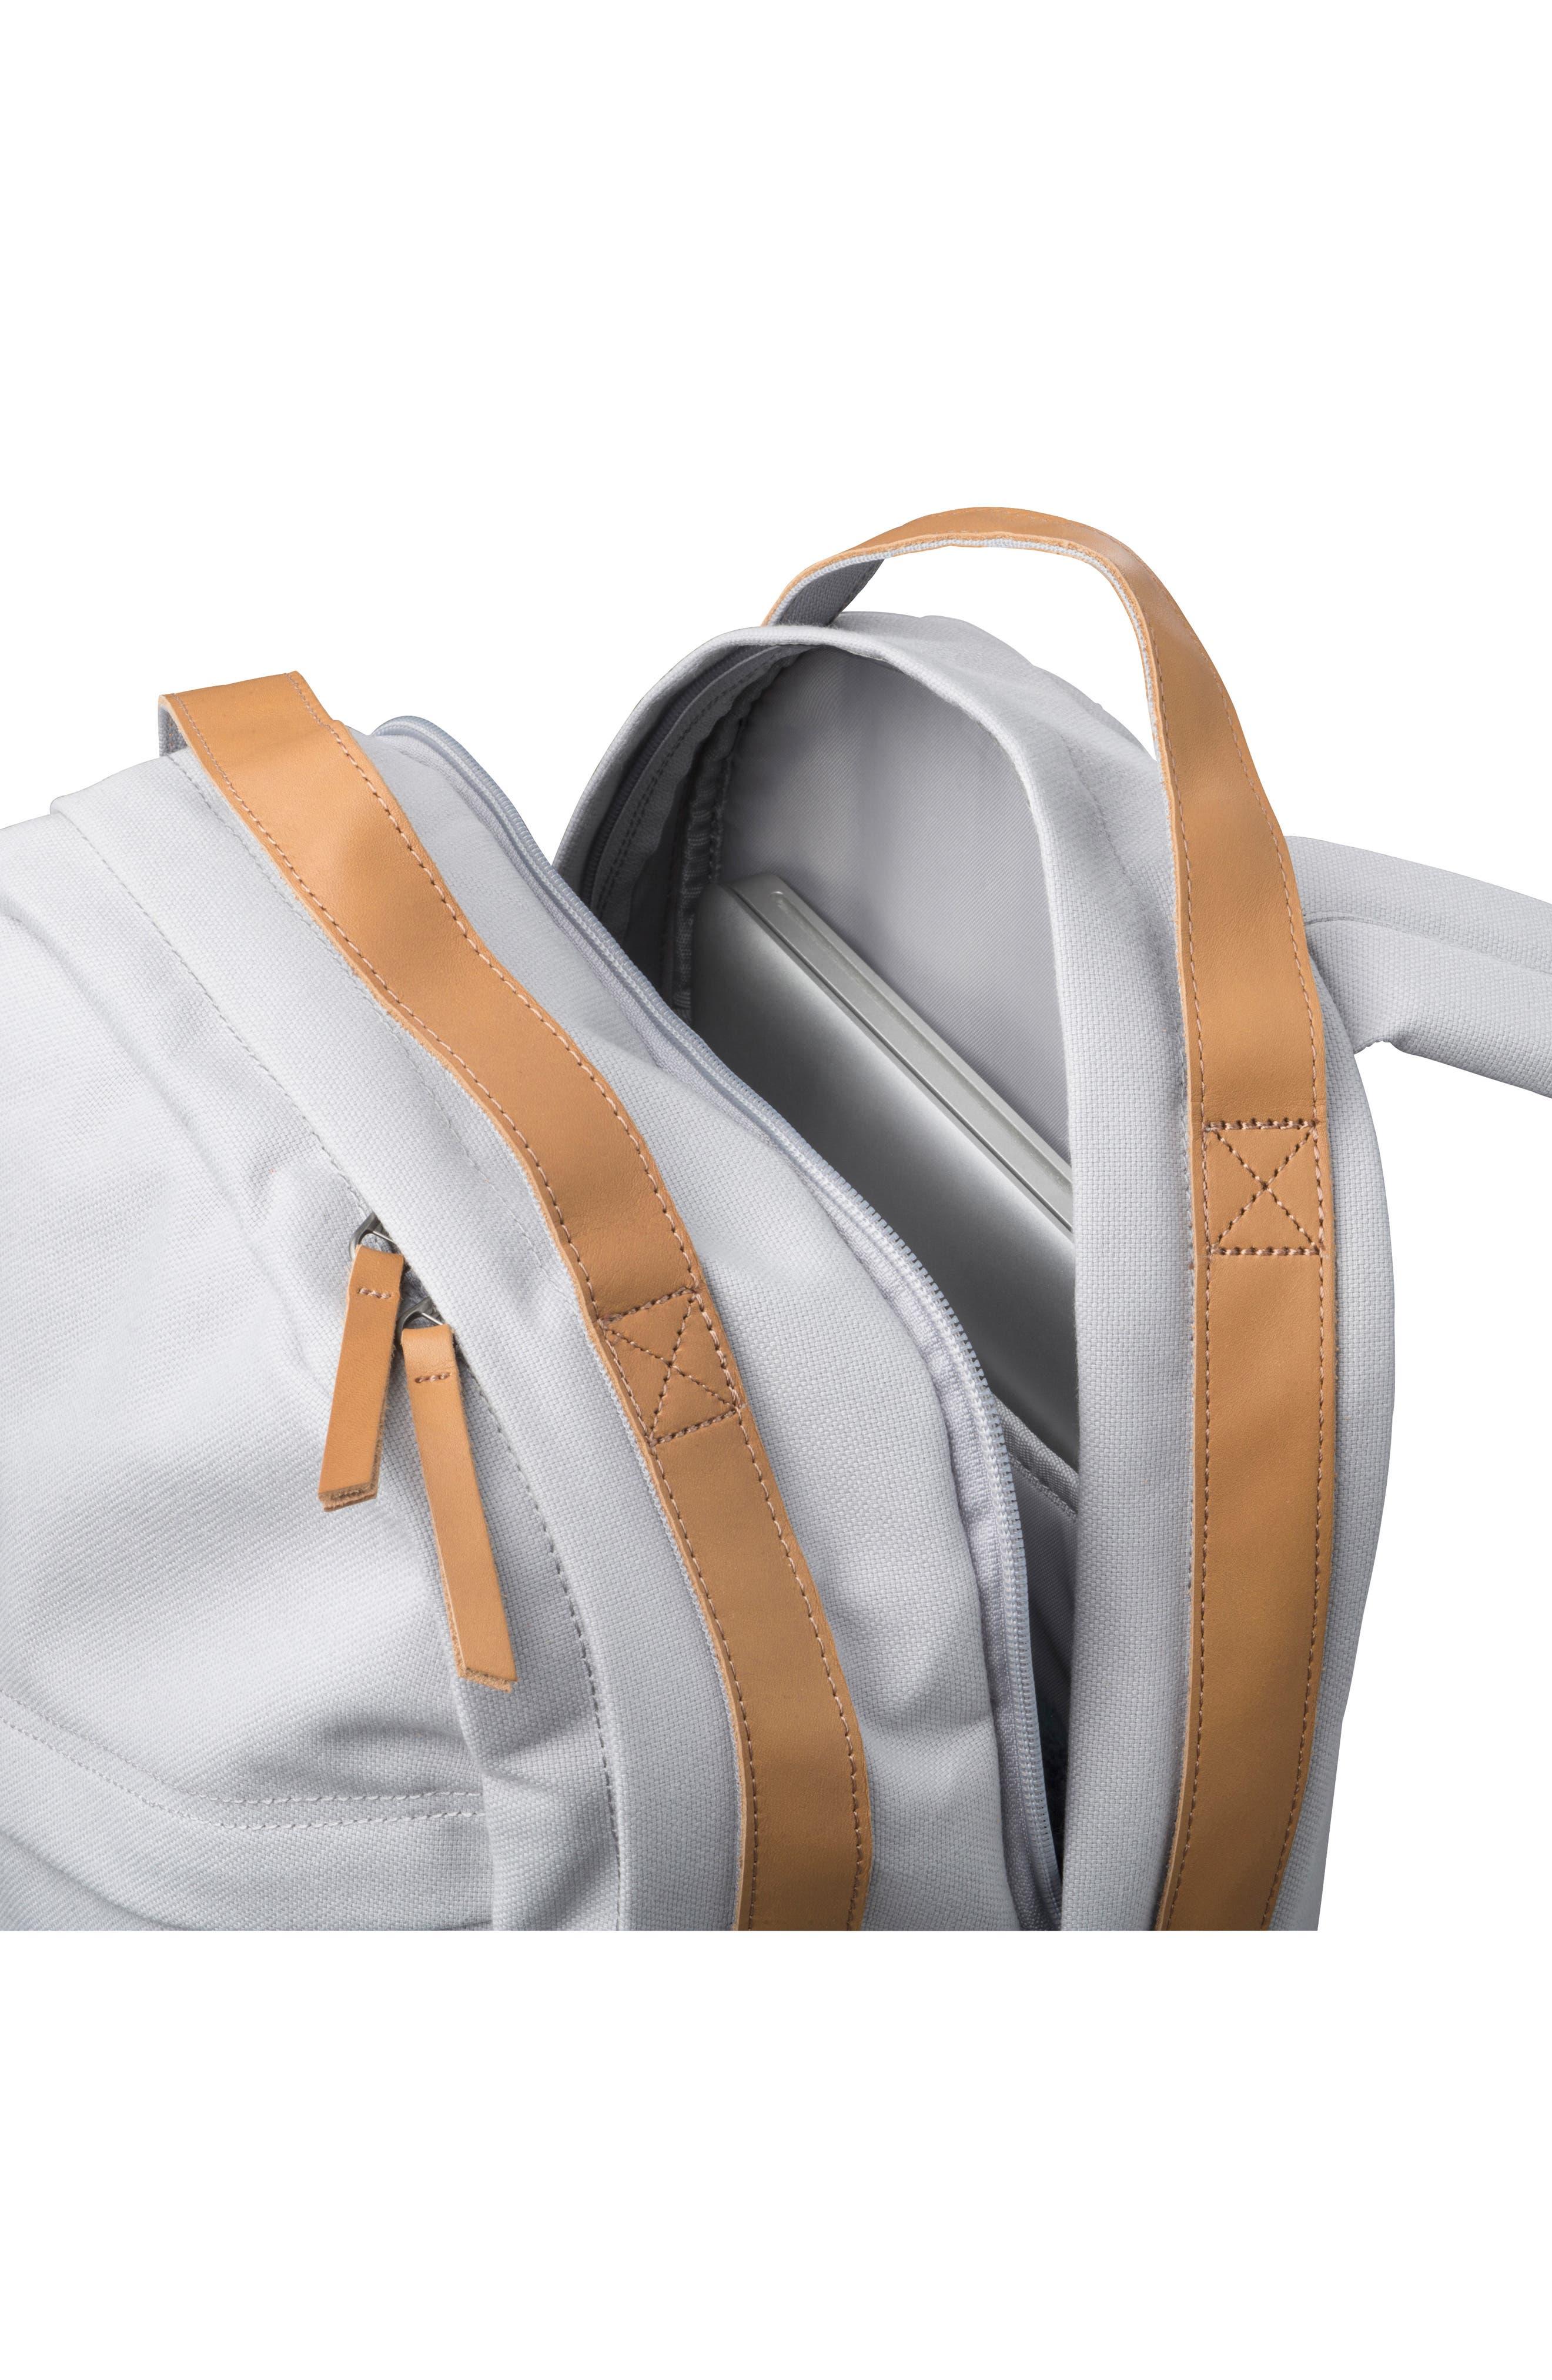 Copenhagen Backpack,                             Alternate thumbnail 3, color,                             SILVER GREY